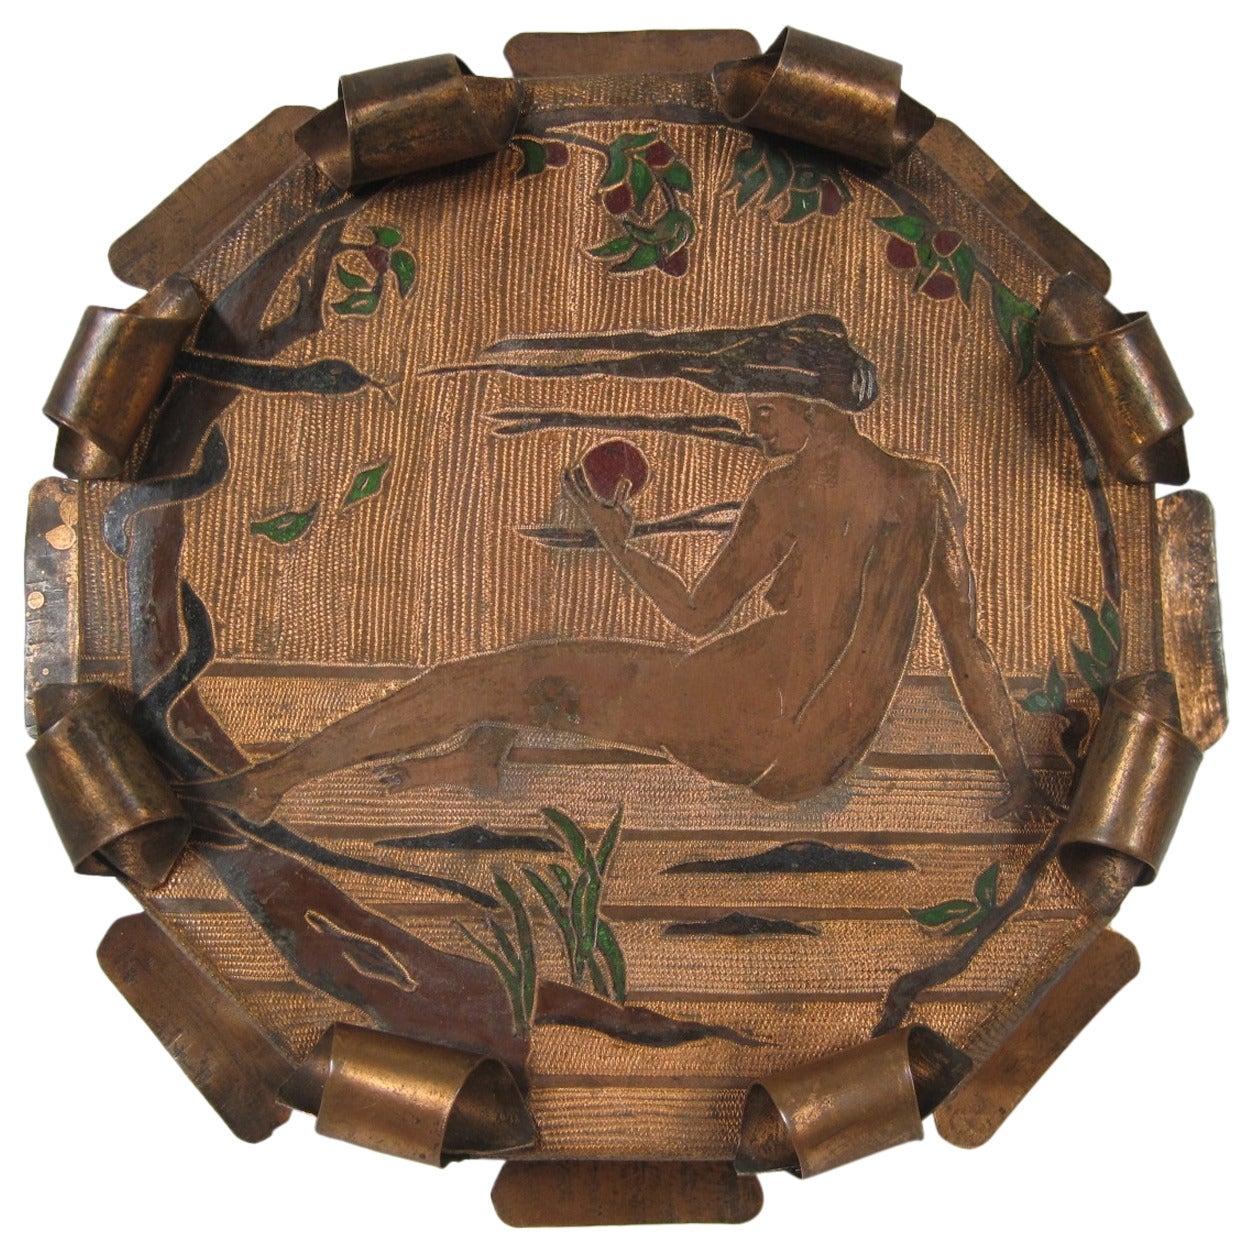 Arts & Crafts Metalware Centerpiece Folk Art Stand